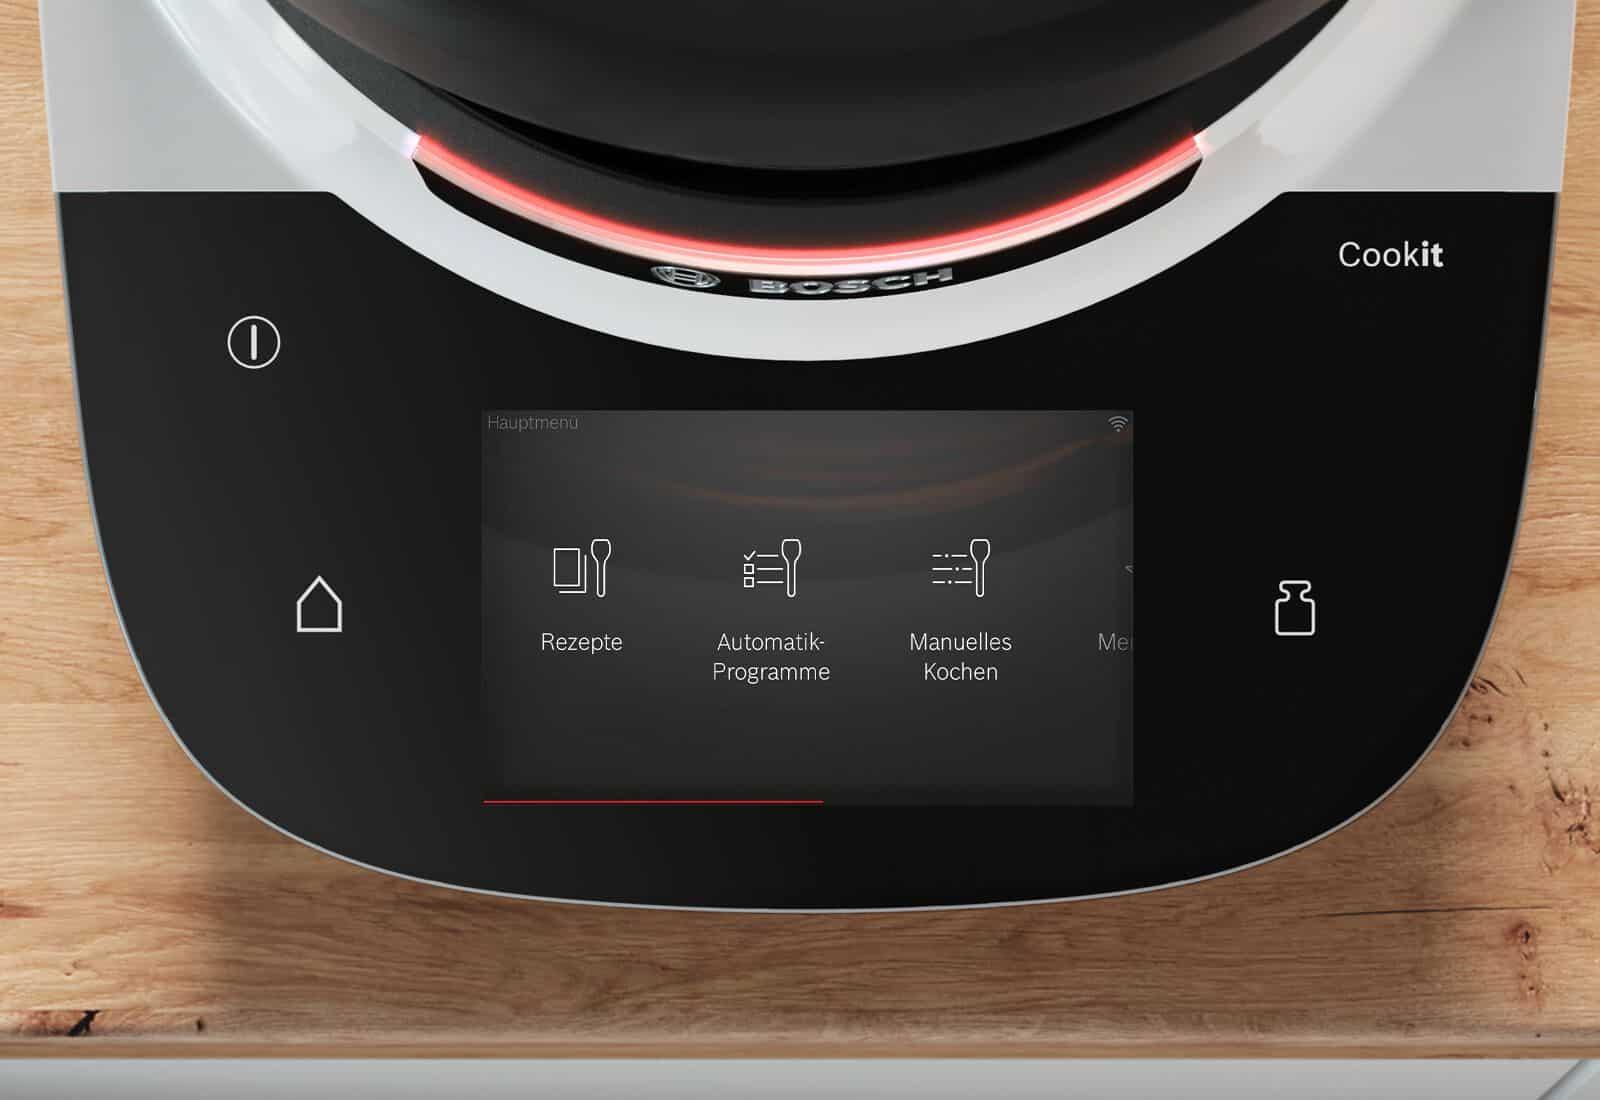 Das intuitive Menü leitet dich direkt zu den Guided Cooking Rezepten, den Automatikprogrammen oder zum manuellen Kochen – schon kann's losgehen! – Foto: PR